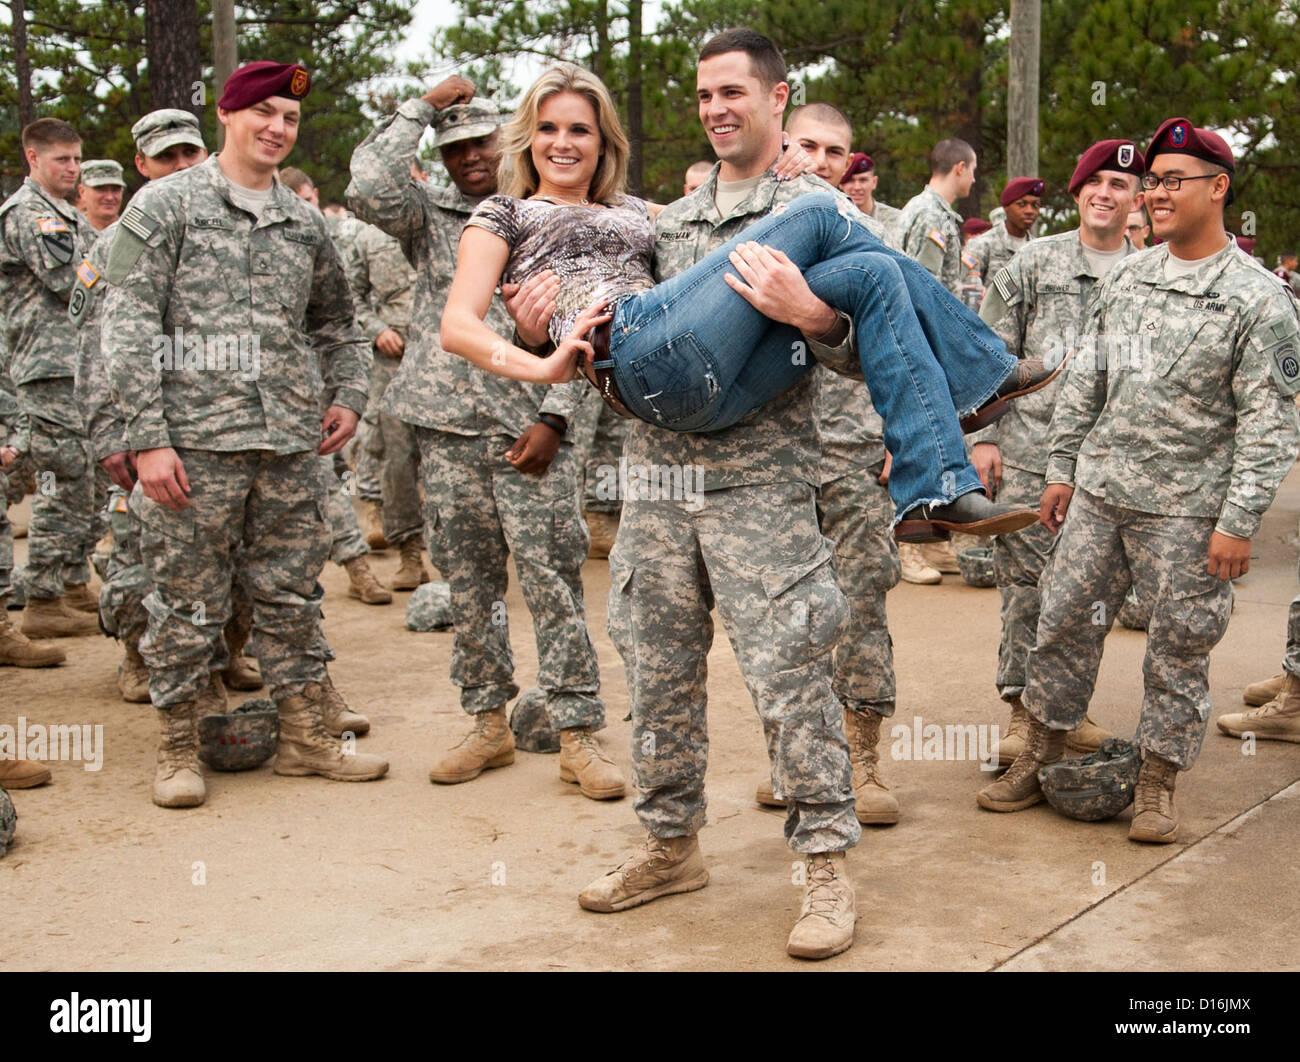 Nashville recording artist Kristy Lee Cook is swept off her feet by 2nd Lt. Jake Freeman, a native of Suwanee, Ga., - Stock Image